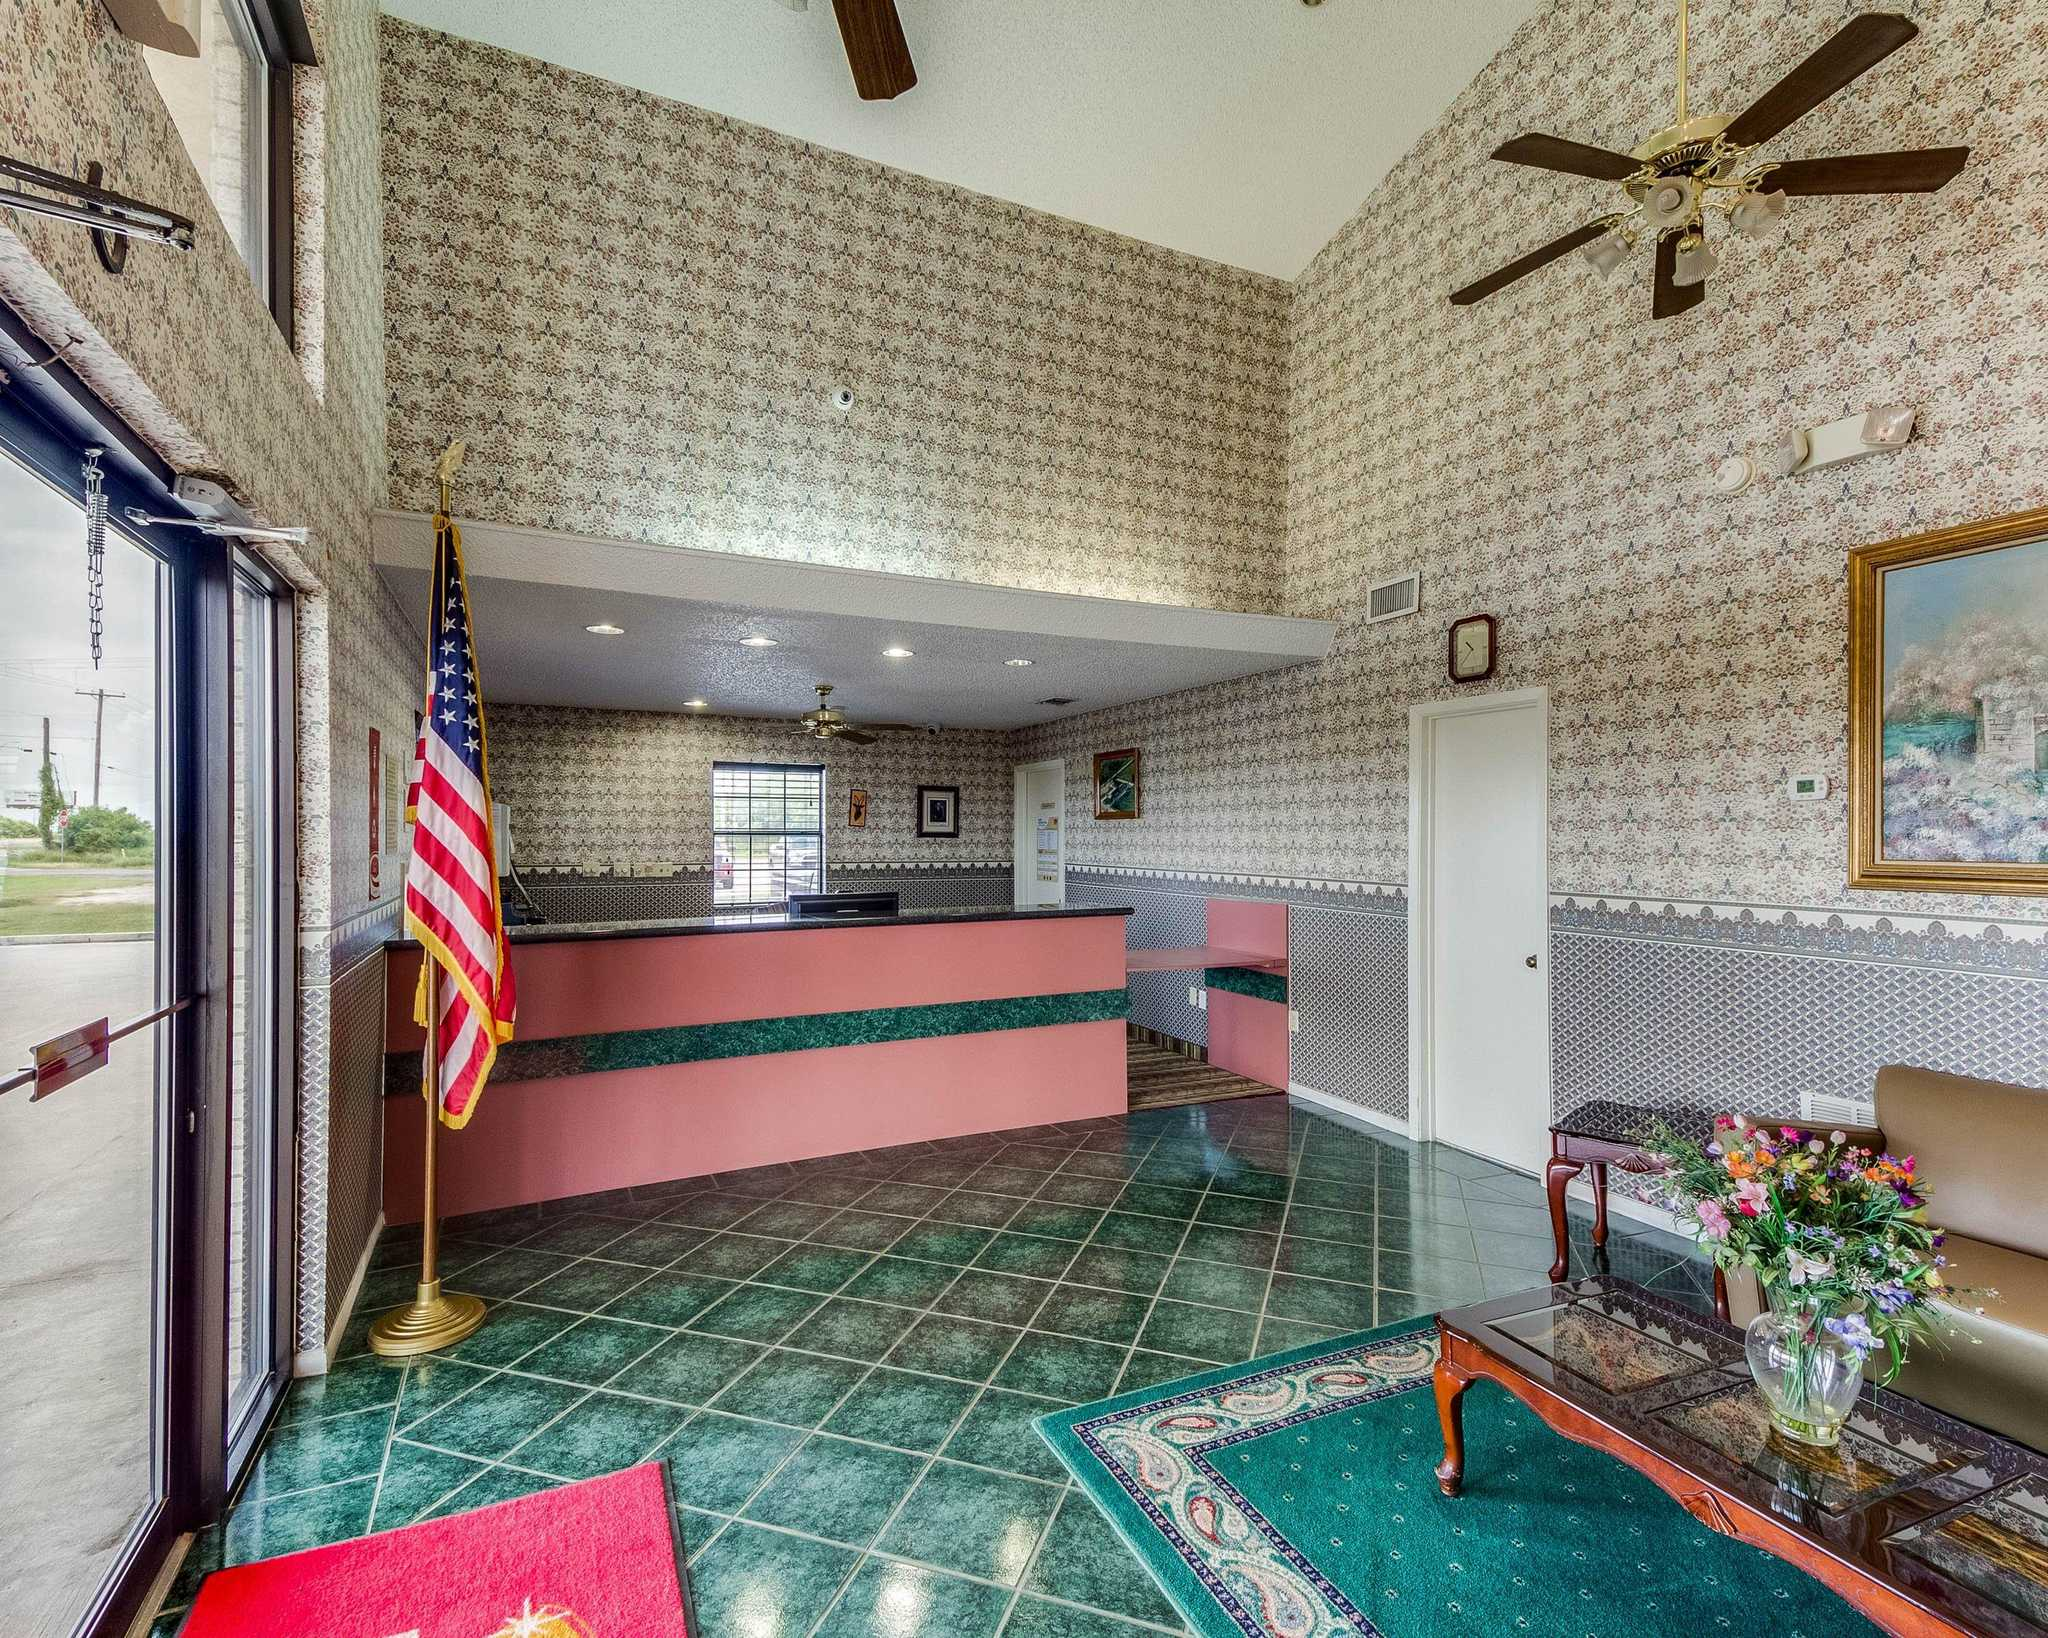 Econo Lodge image 13